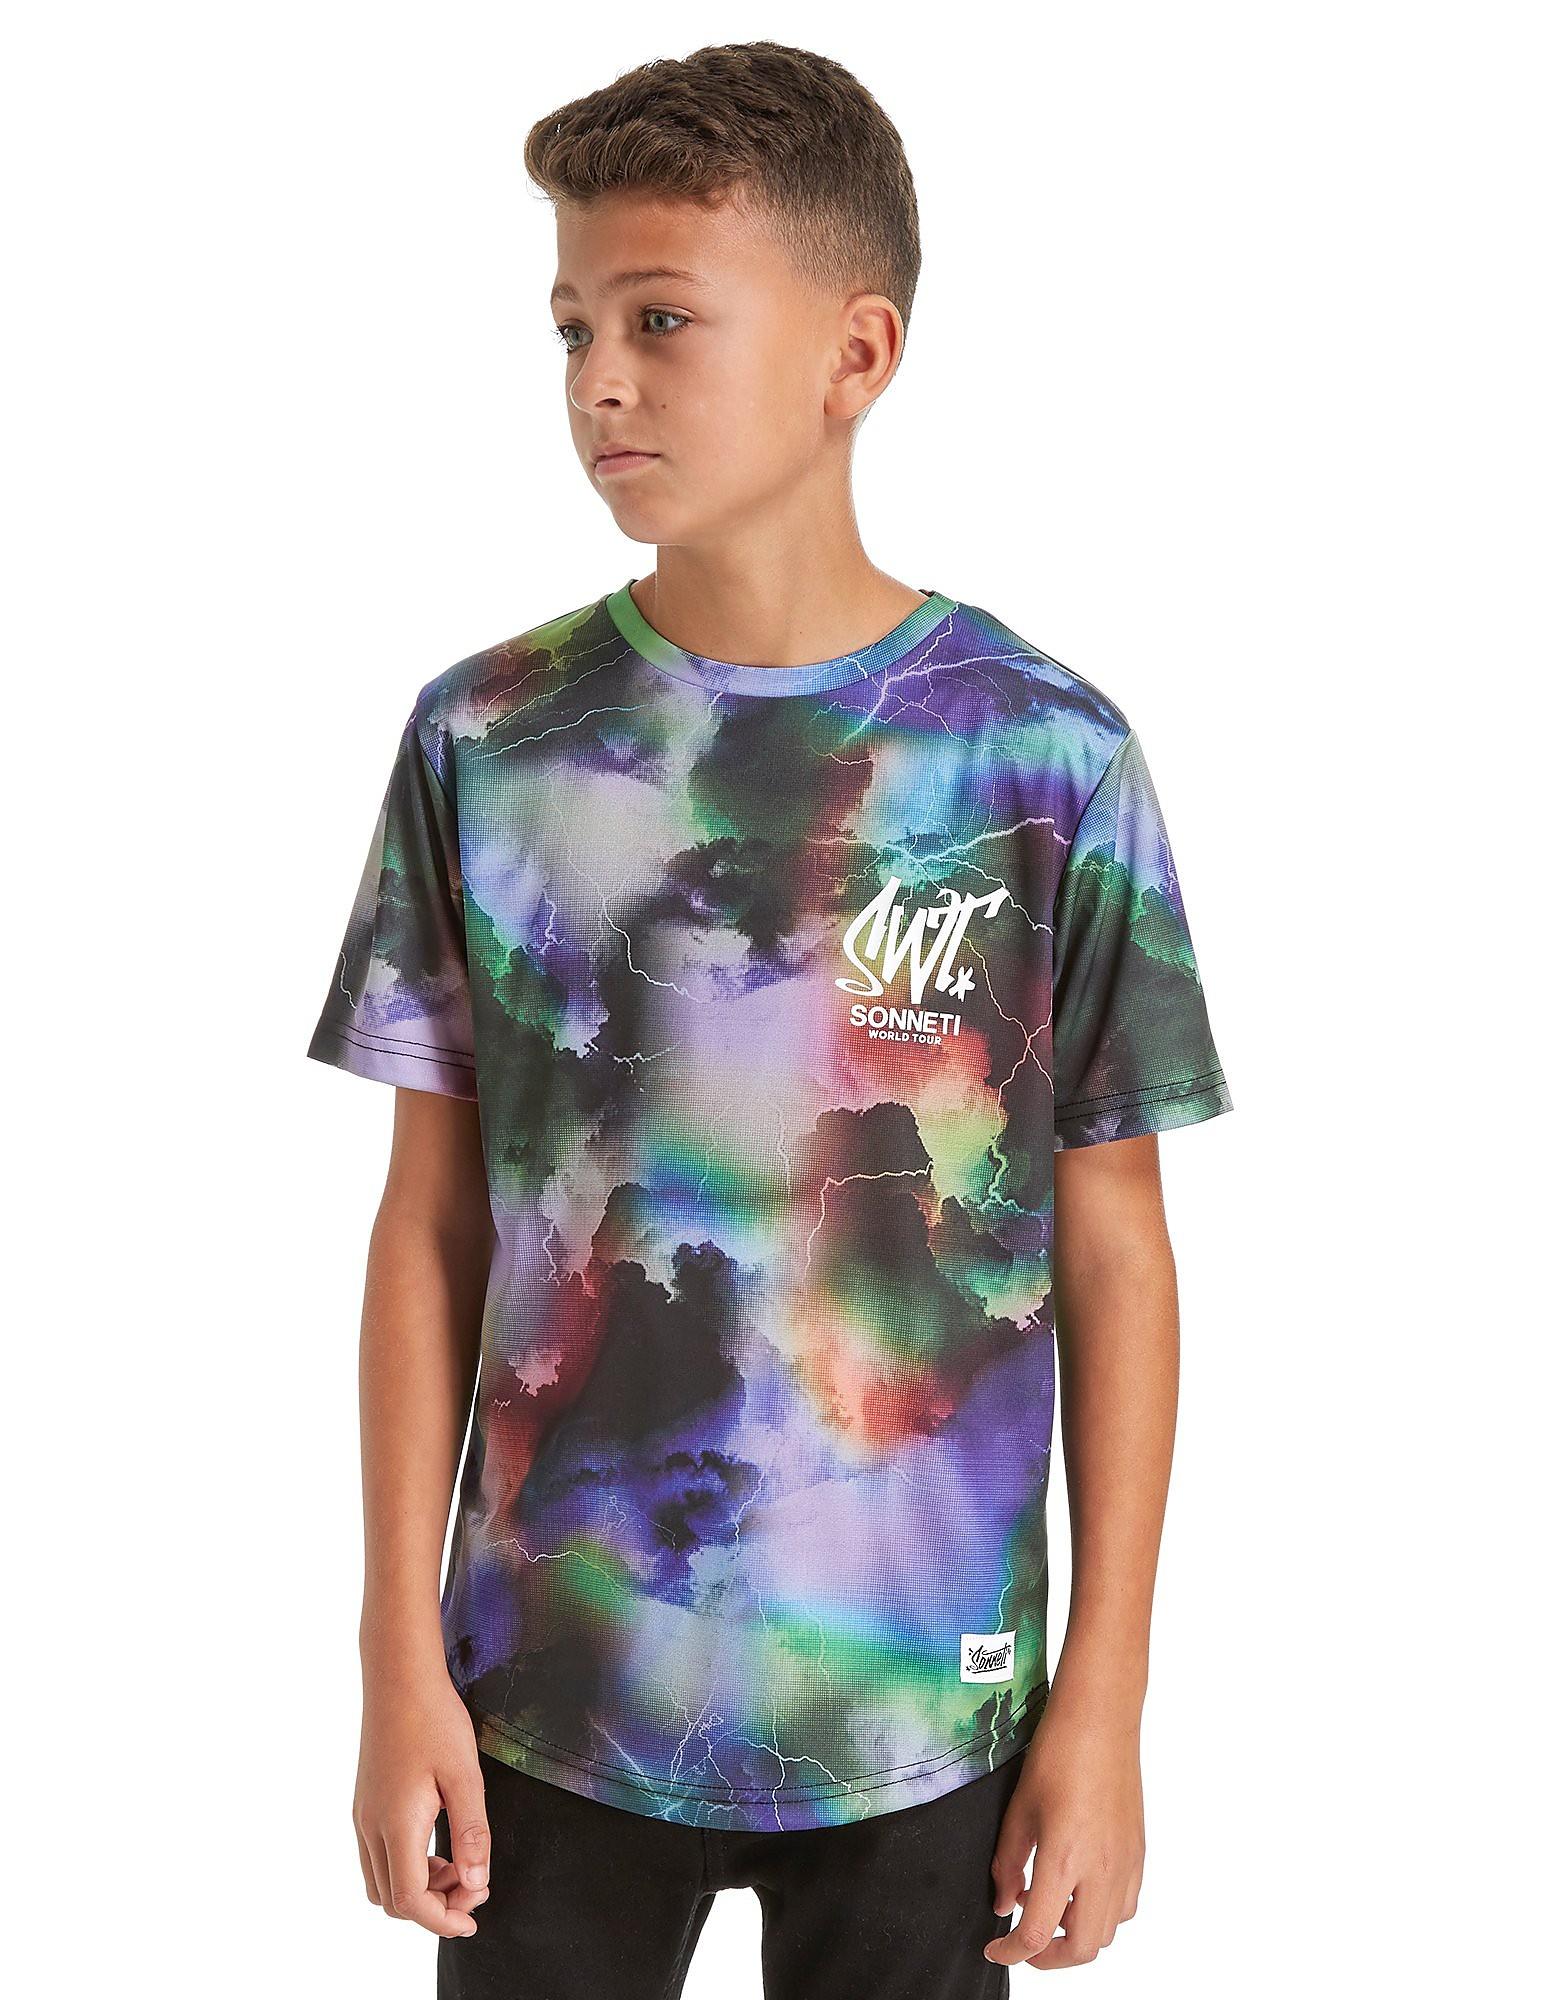 Sonneti Storm T-Shirt Junior